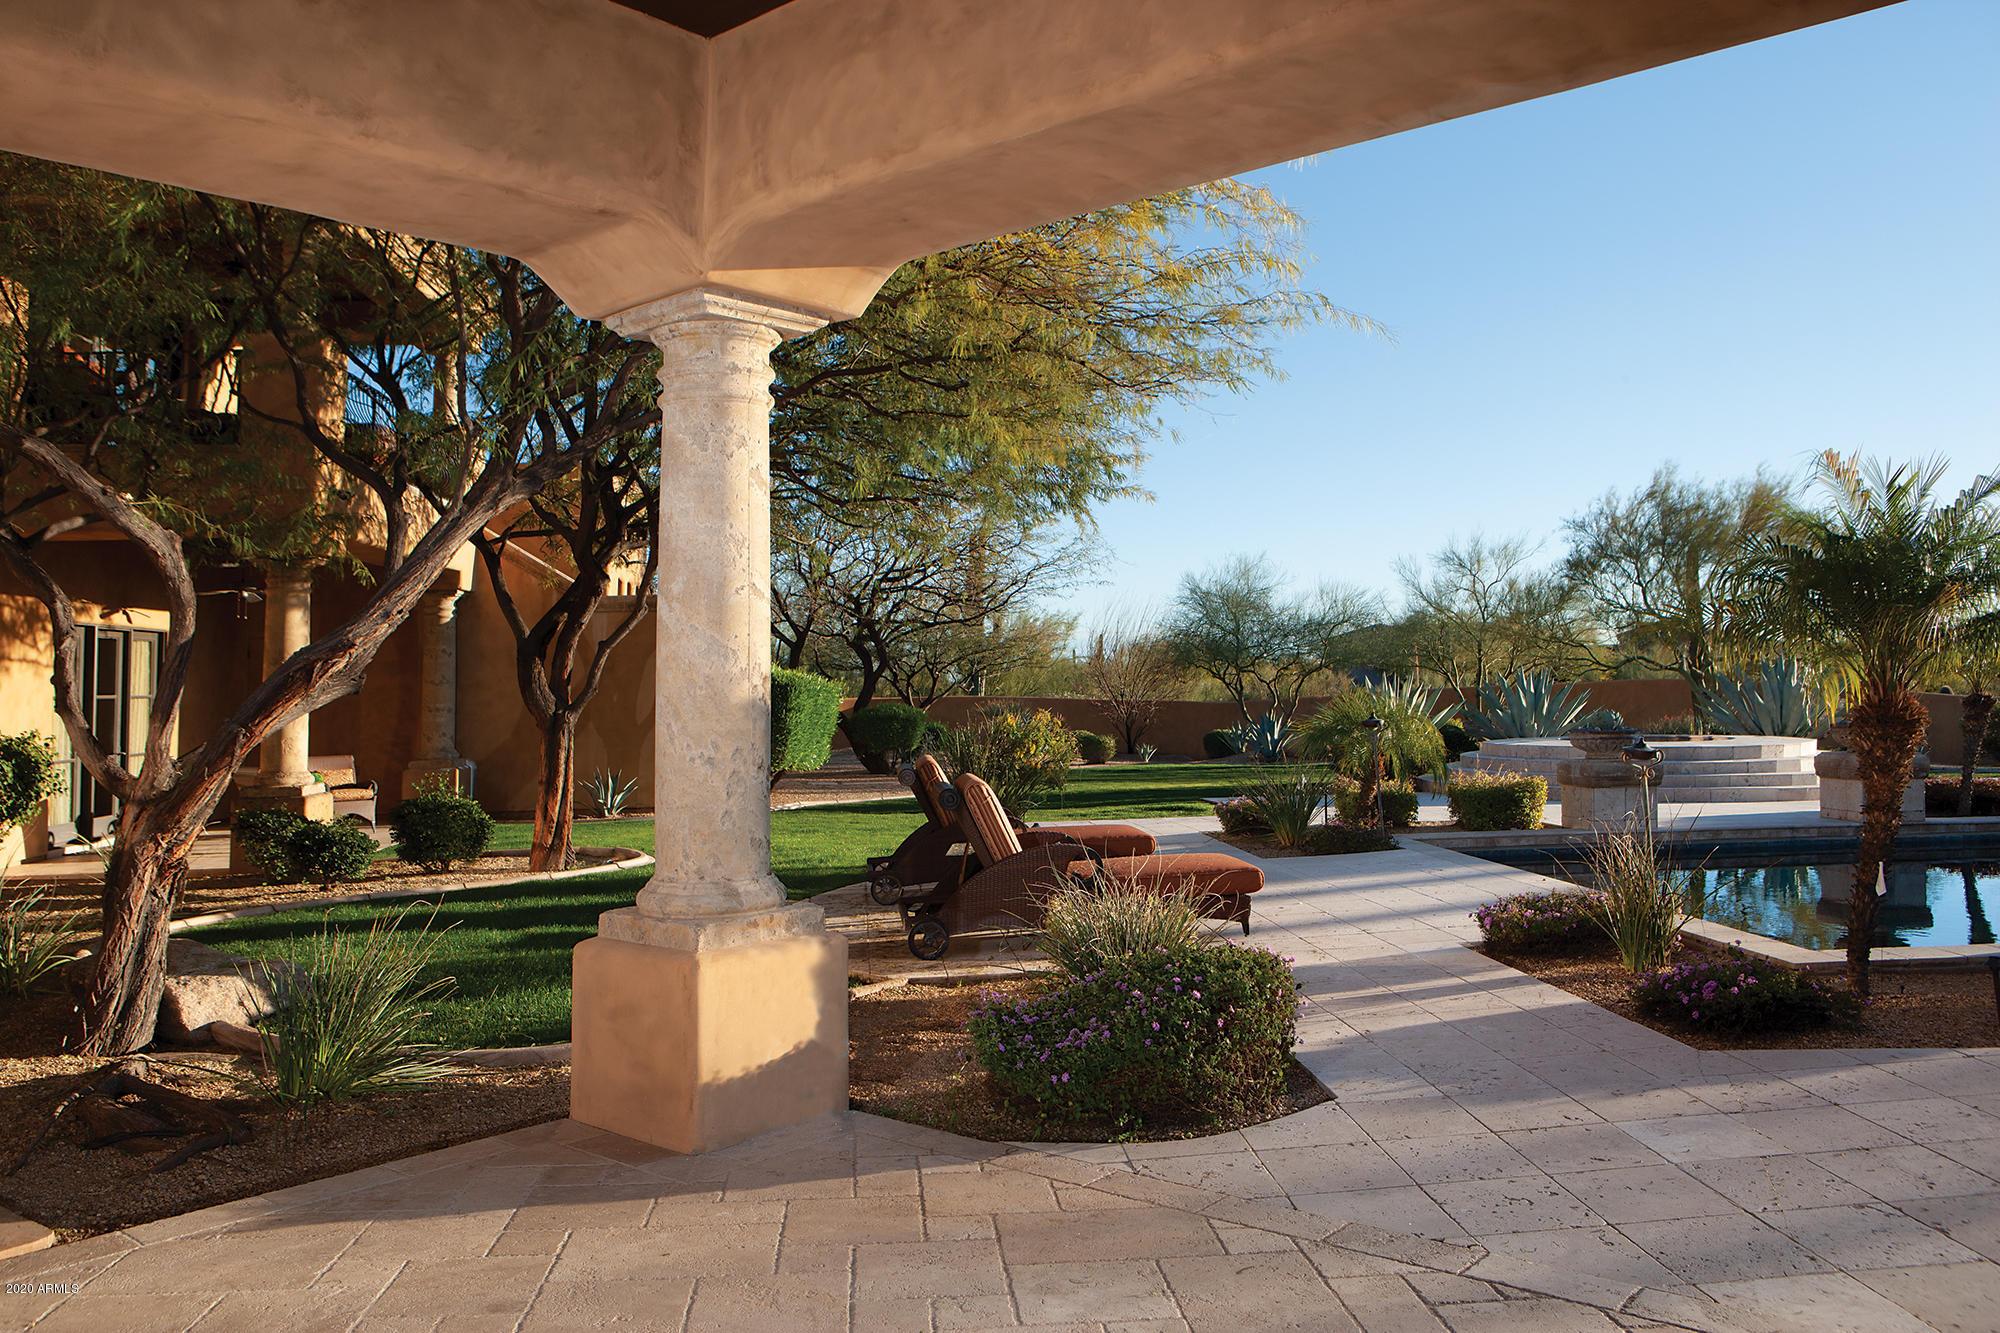 28070 N 91st St Scottsdale, AZ